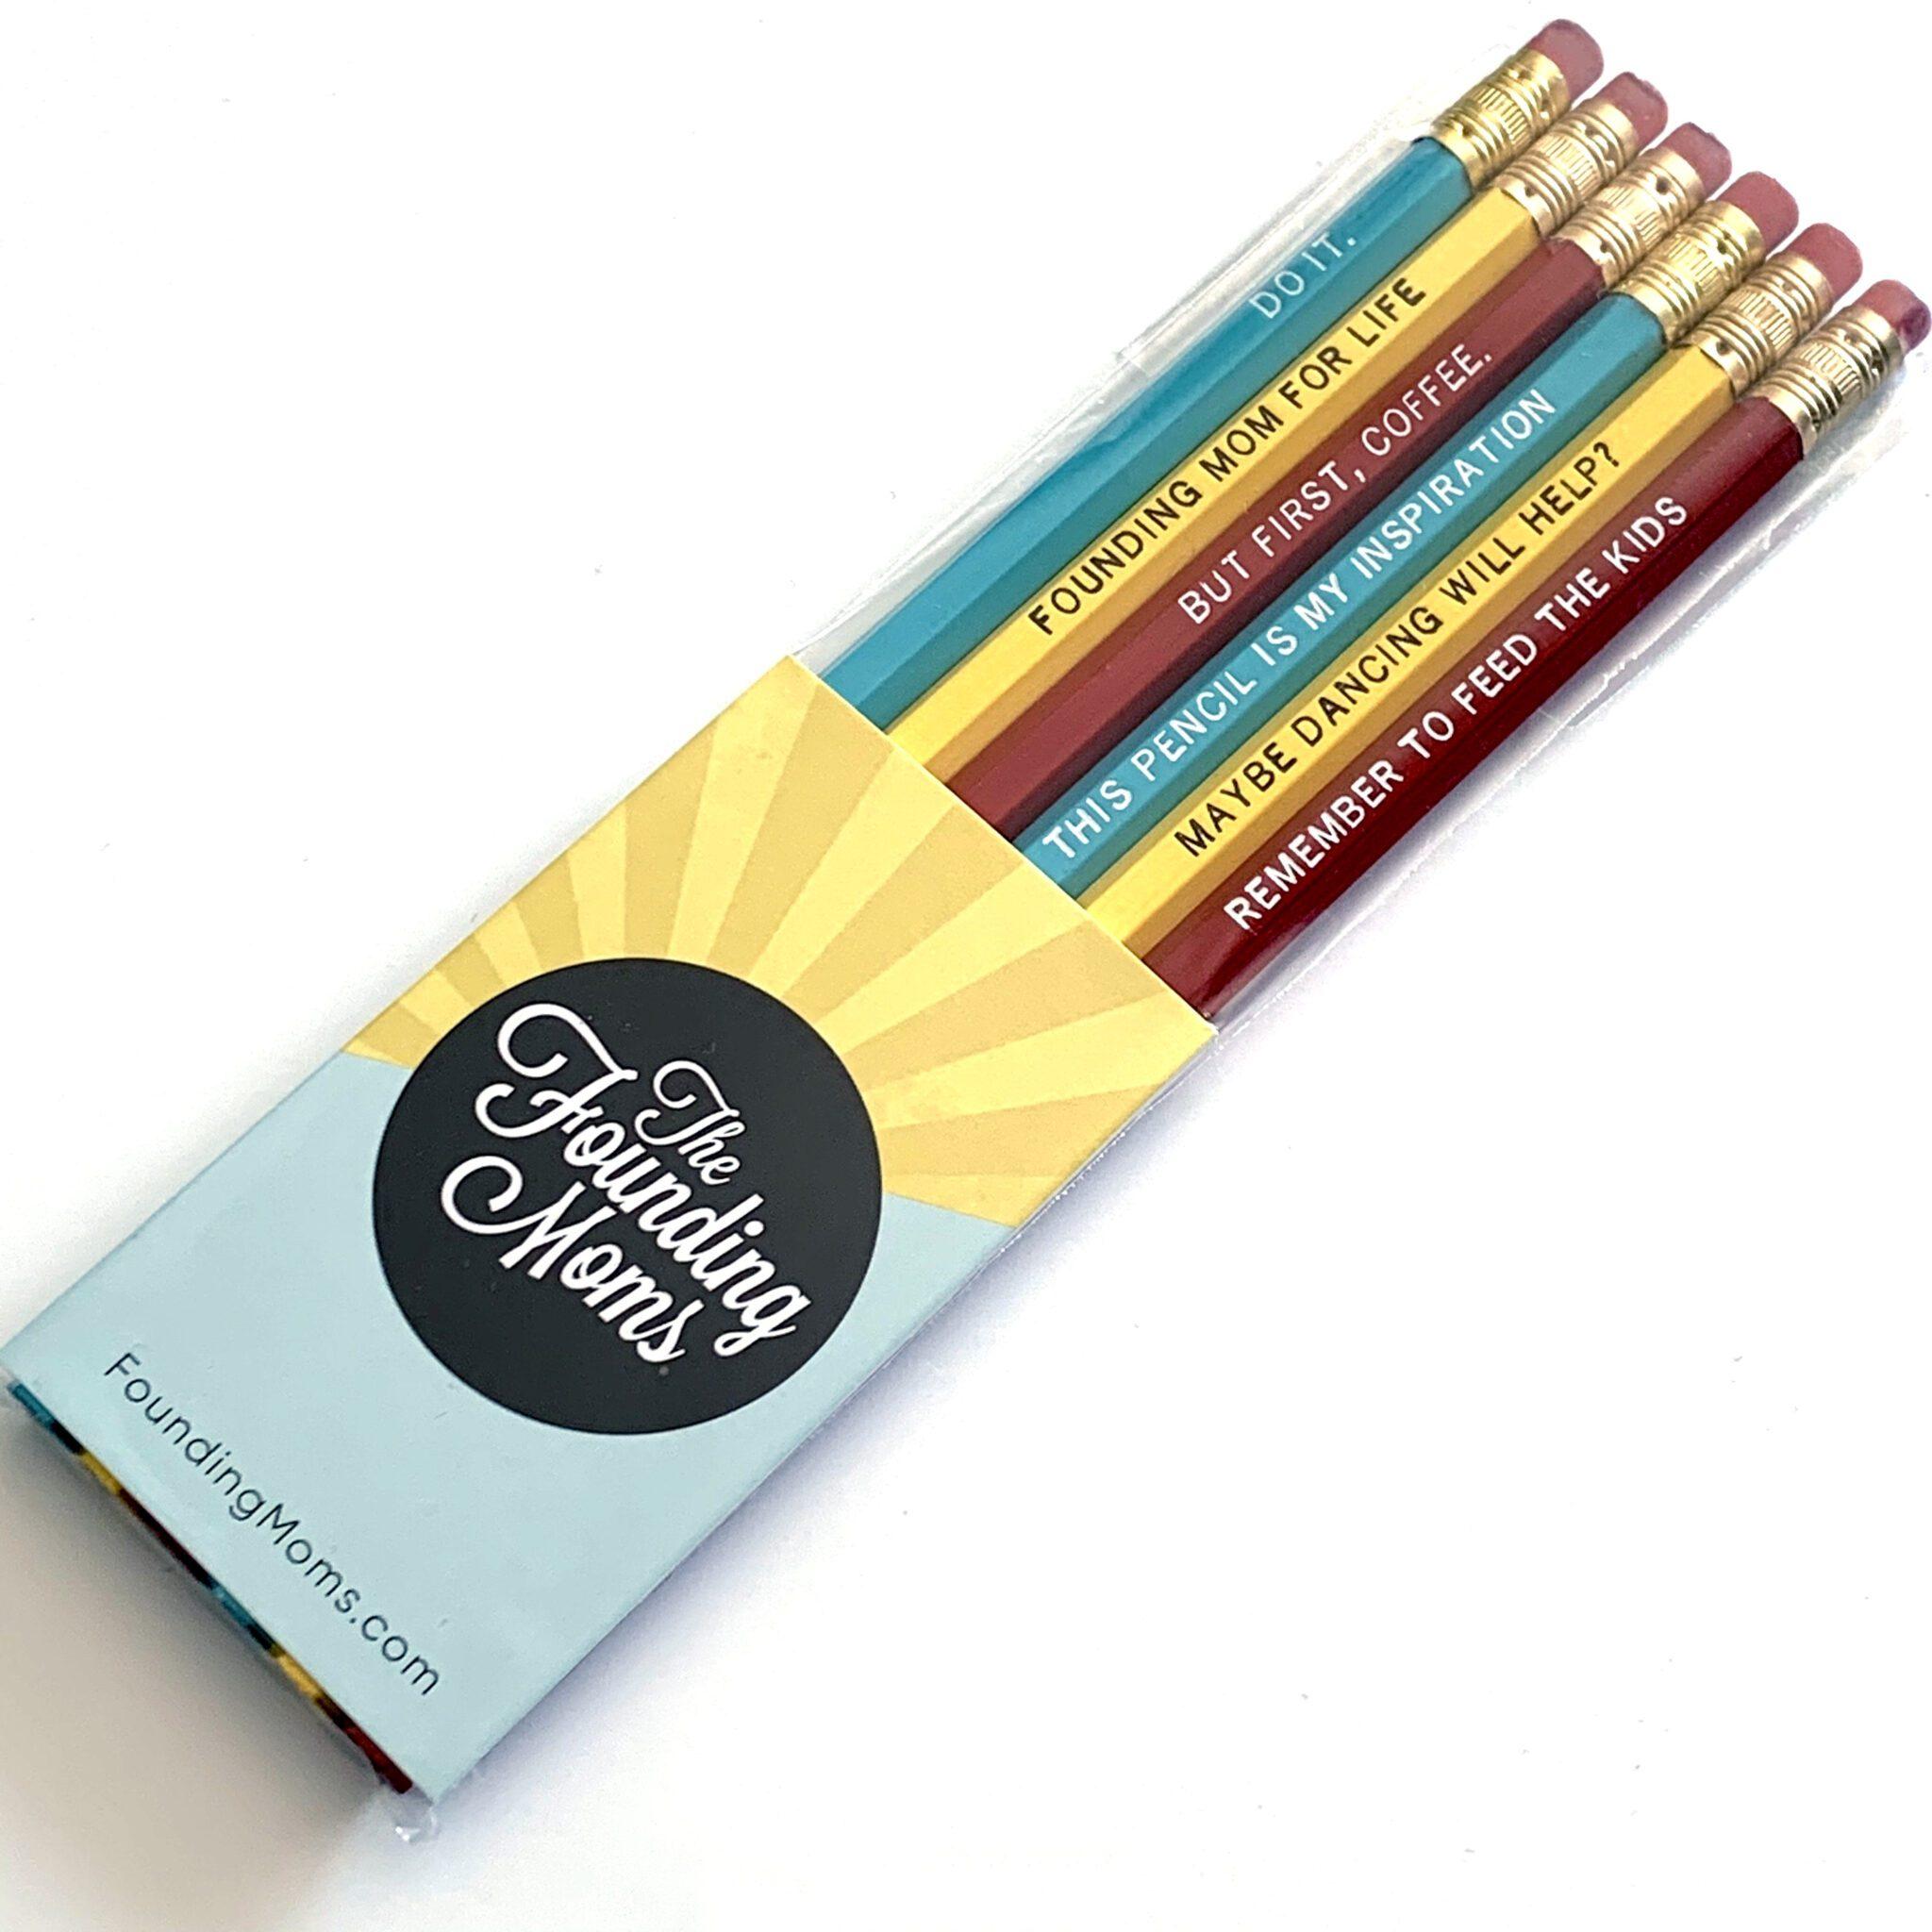 The Founding Moms Pencil Set.